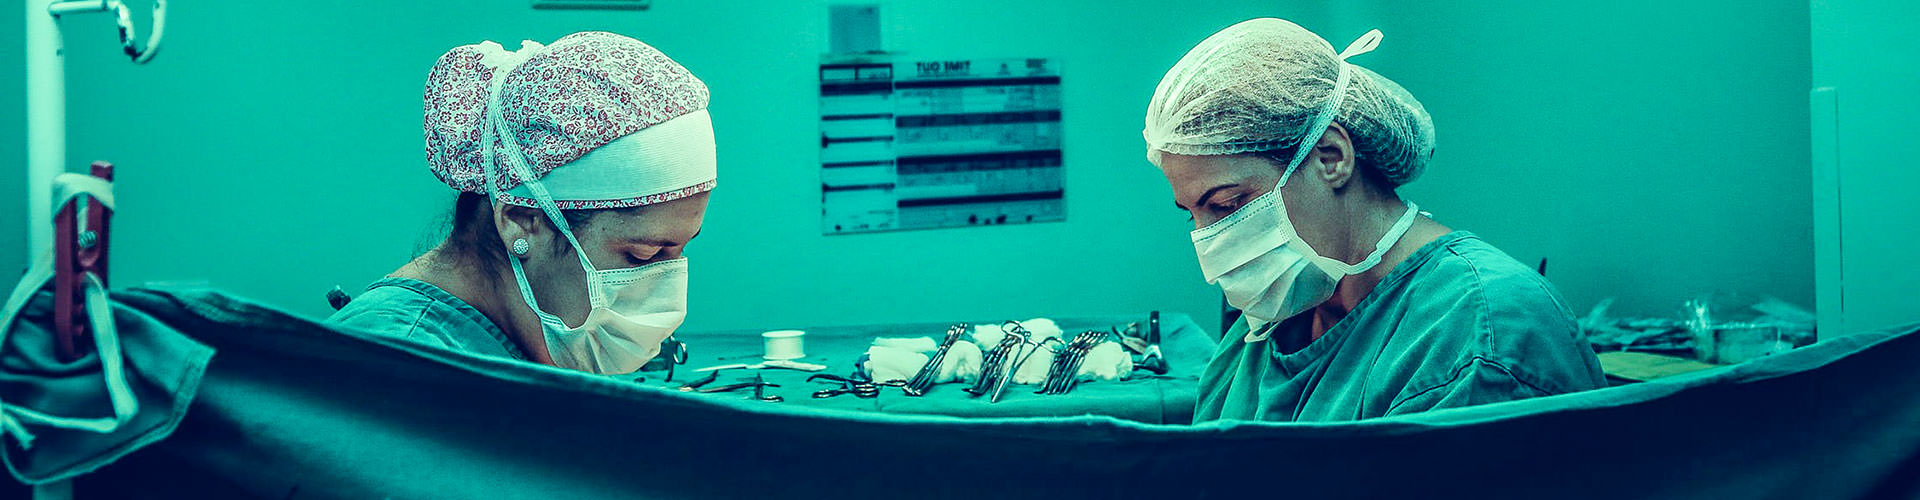 Medici Cardiochirurghi